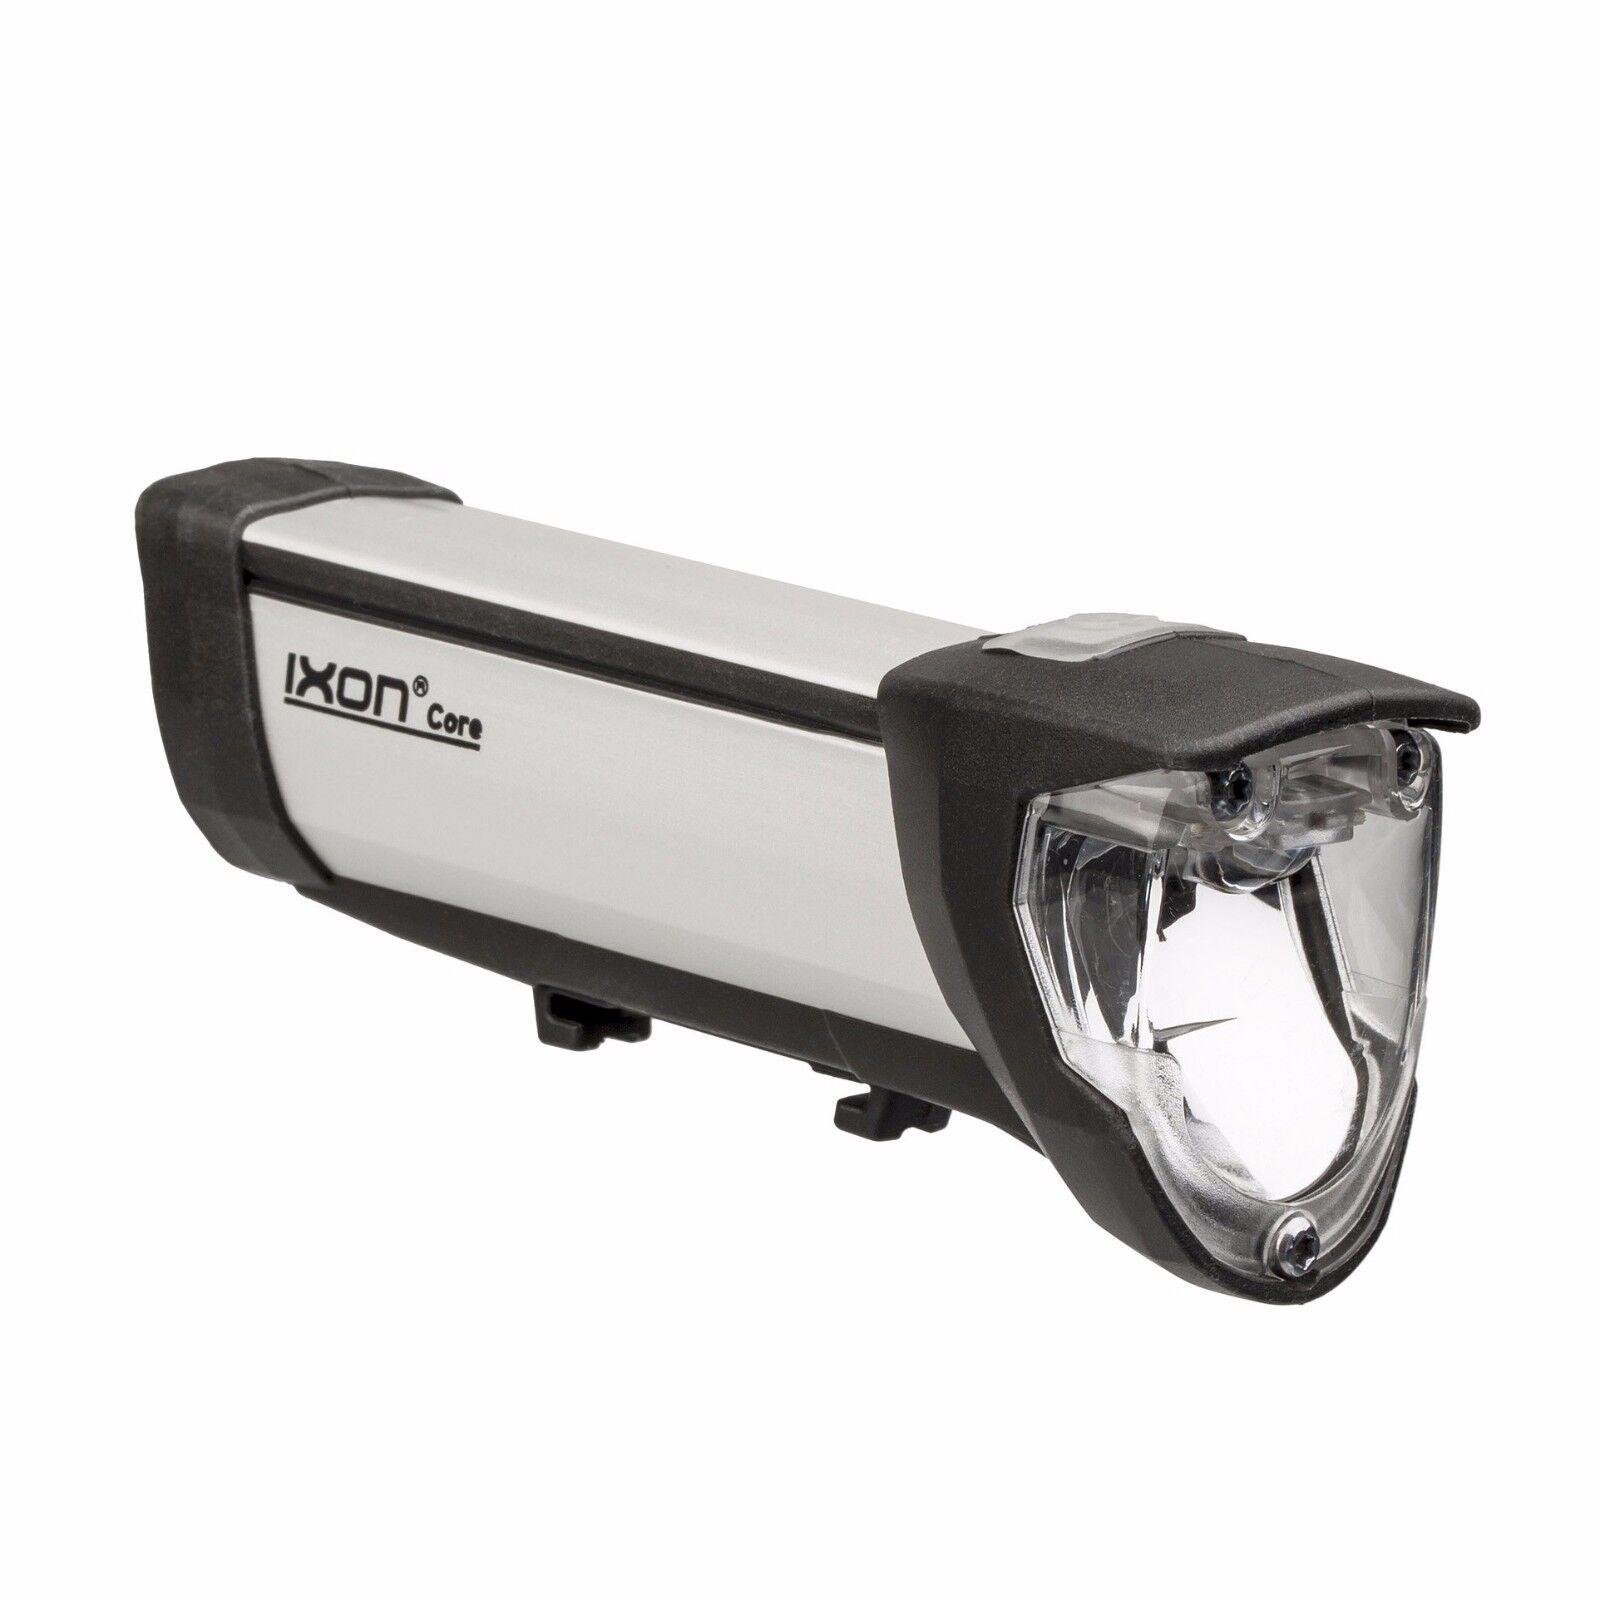 Busch & Muller IXON Core   USB Rechargeable Bike White LED Front   Head Light